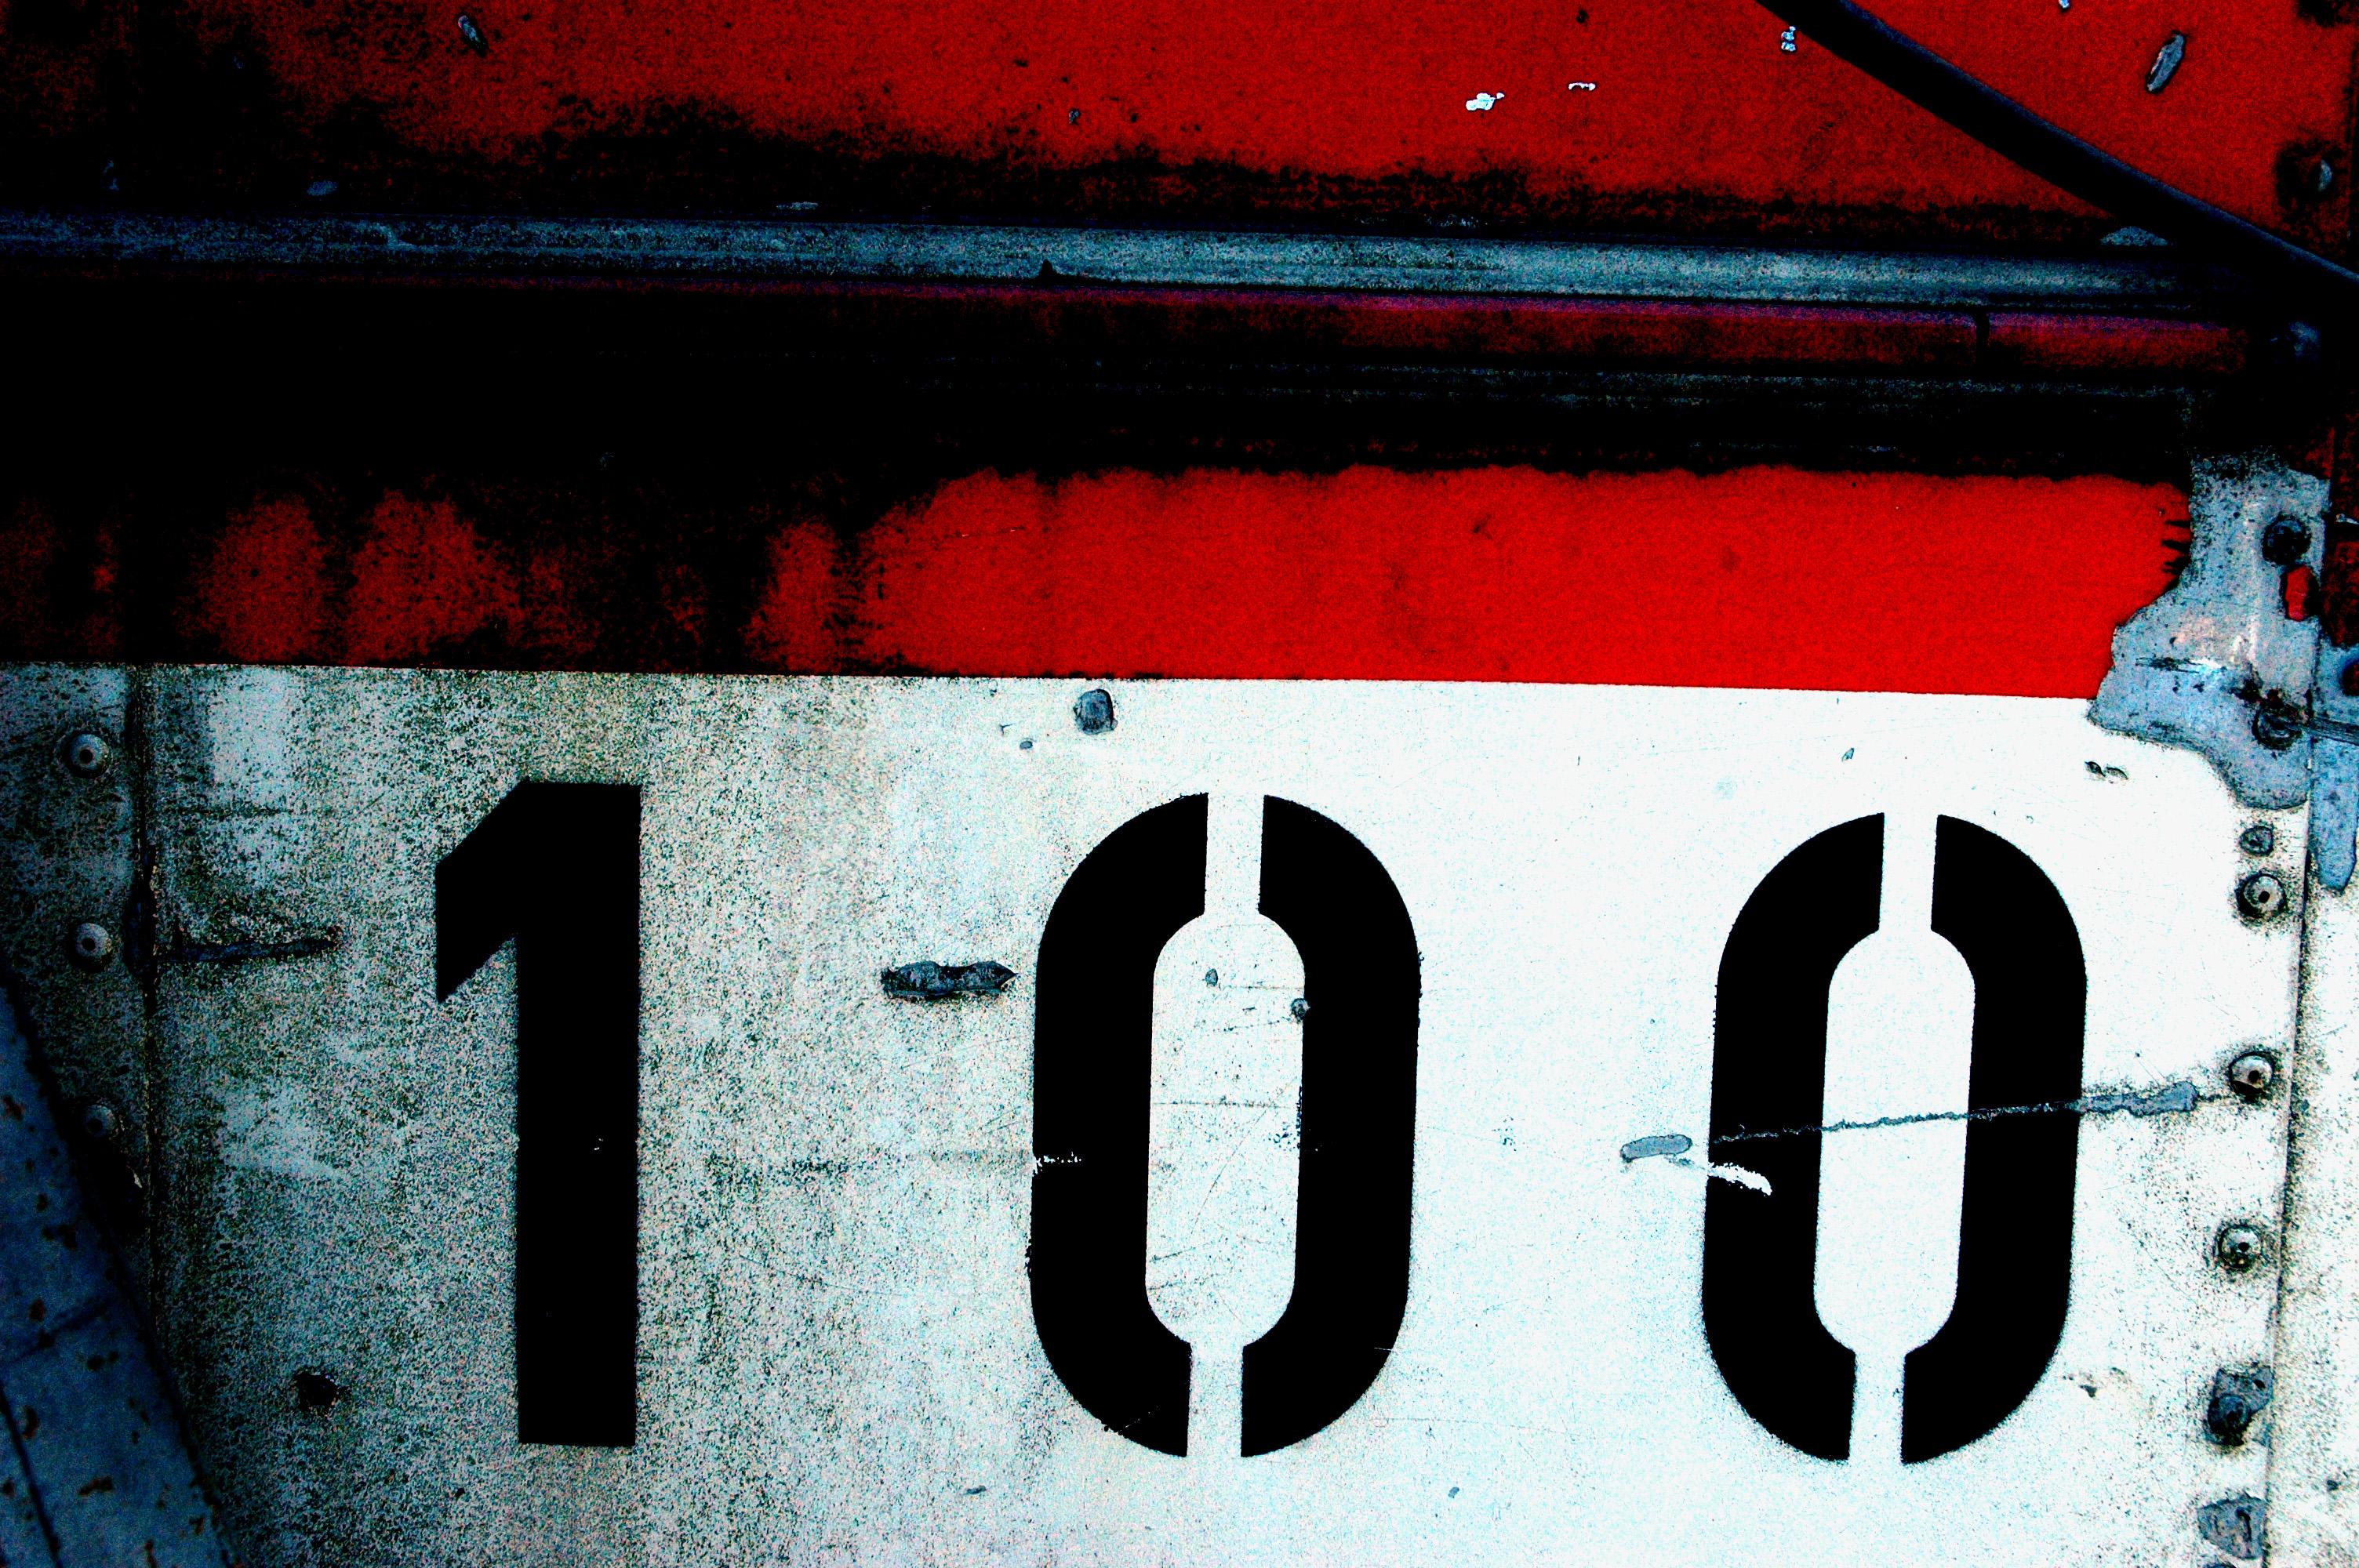 100ème revue #Paie #RH #GRH & #SIRH (du 04/06/2012) !